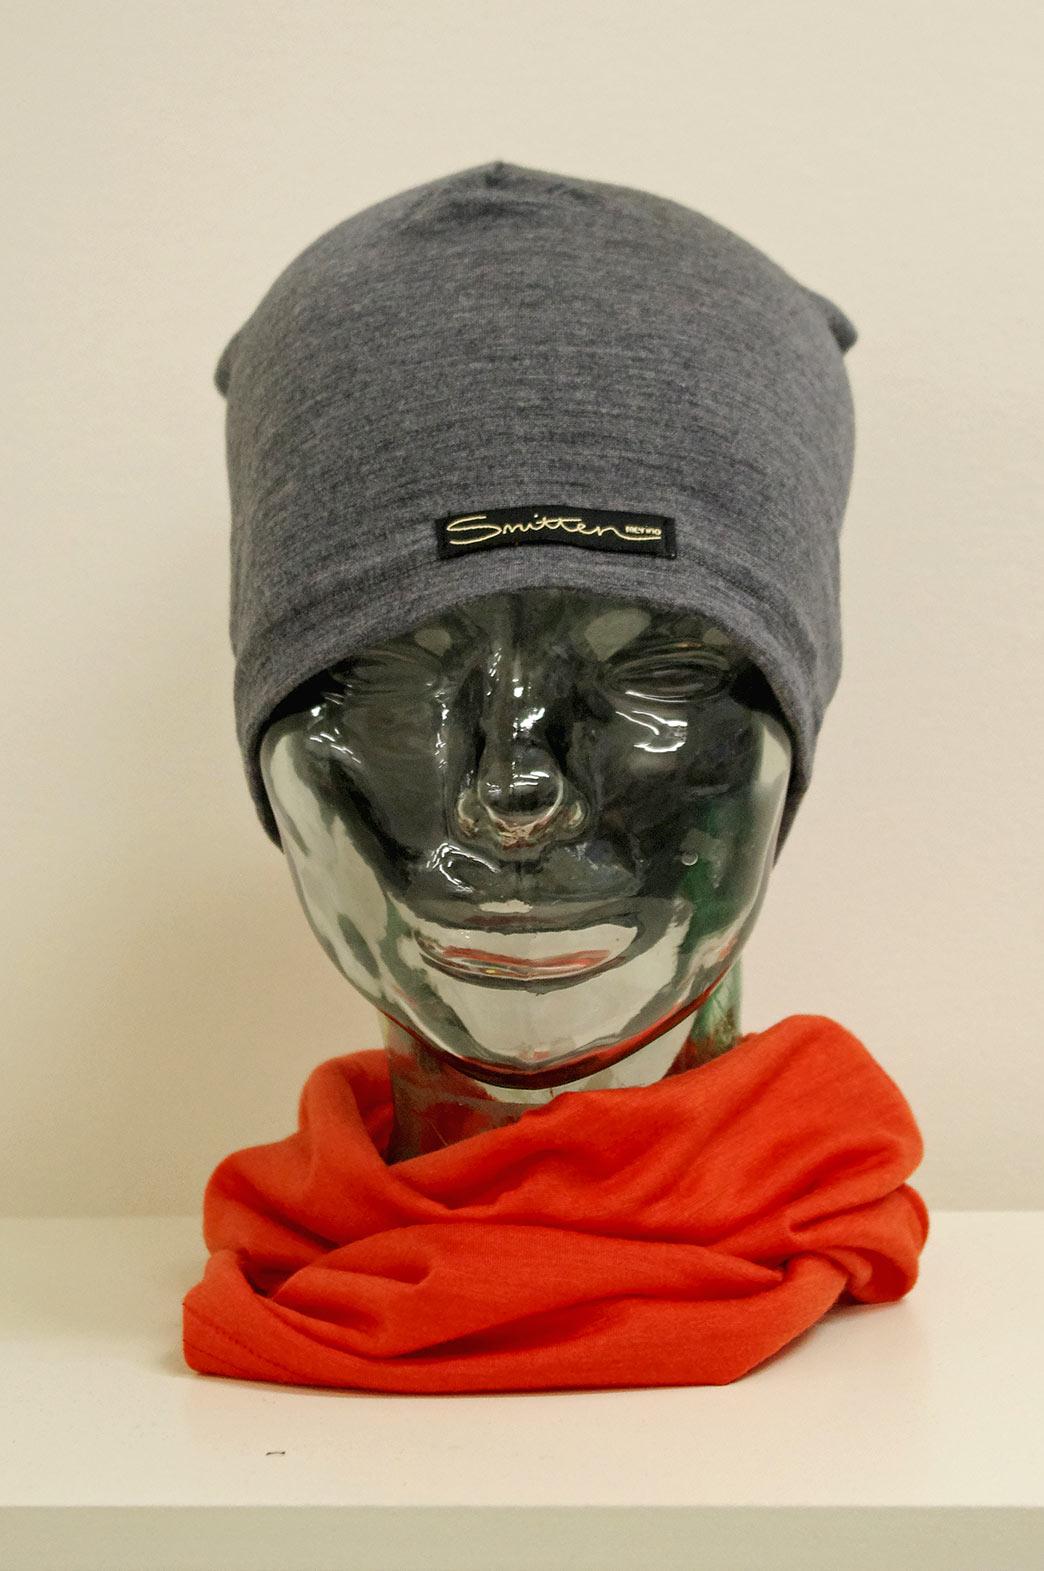 Beanie - Lightweight Skull Cap - Unisex Grey Marl Lightweight Merino Wool Skull Cap Beanie - Smitten Merino Tasmania Australia